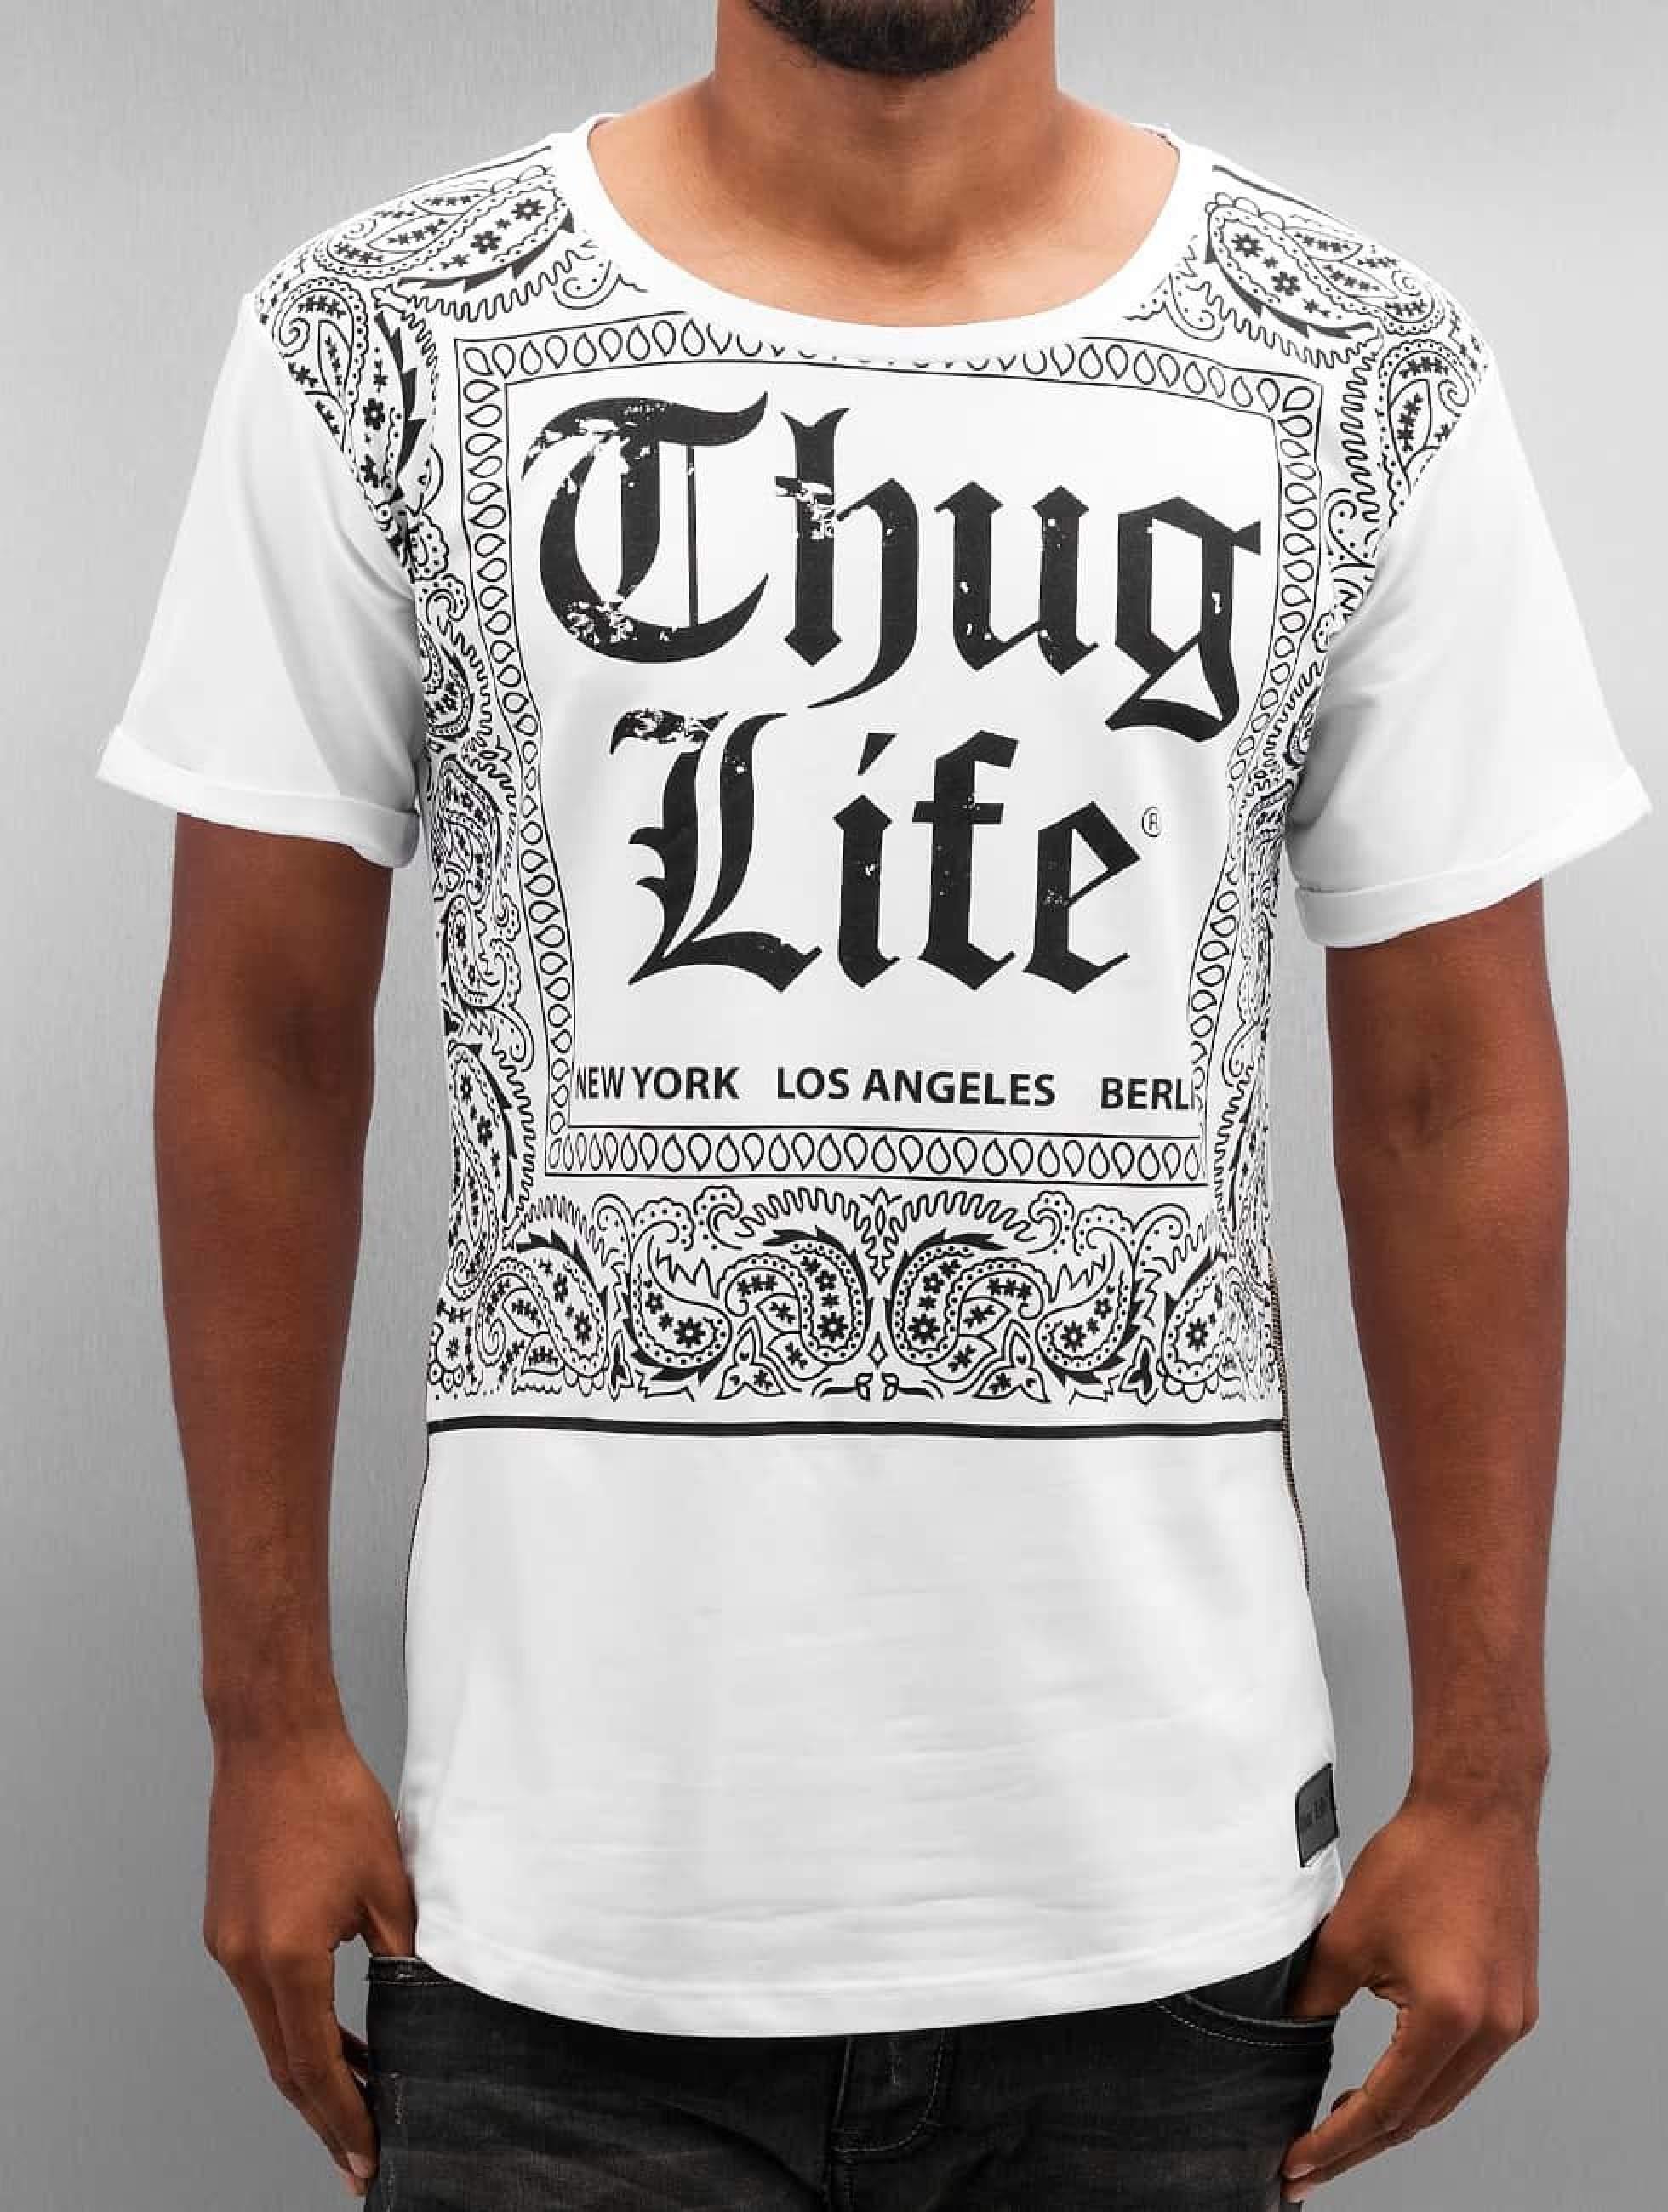 Thug Life / T-Shirt Bandana in white XL